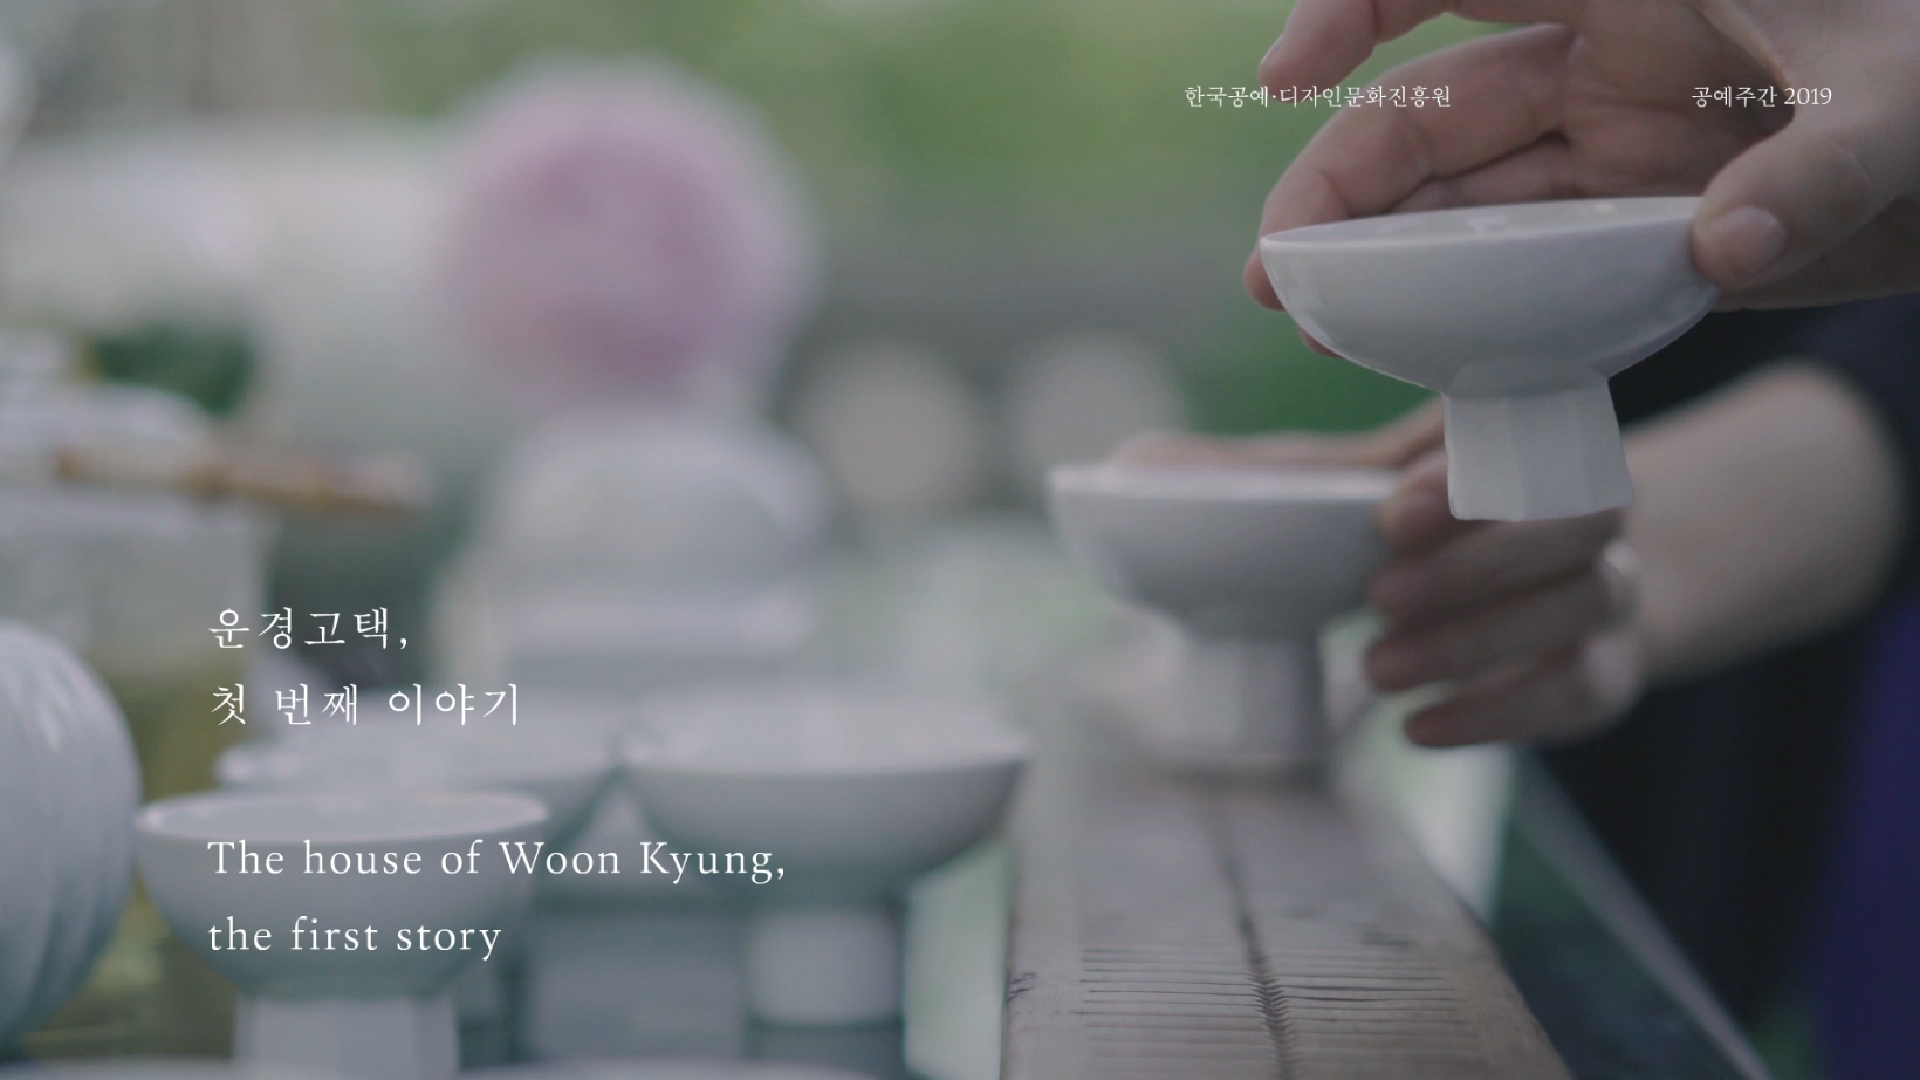 Short videos - 15초- 2분 미만의 효과적인 홍보영상